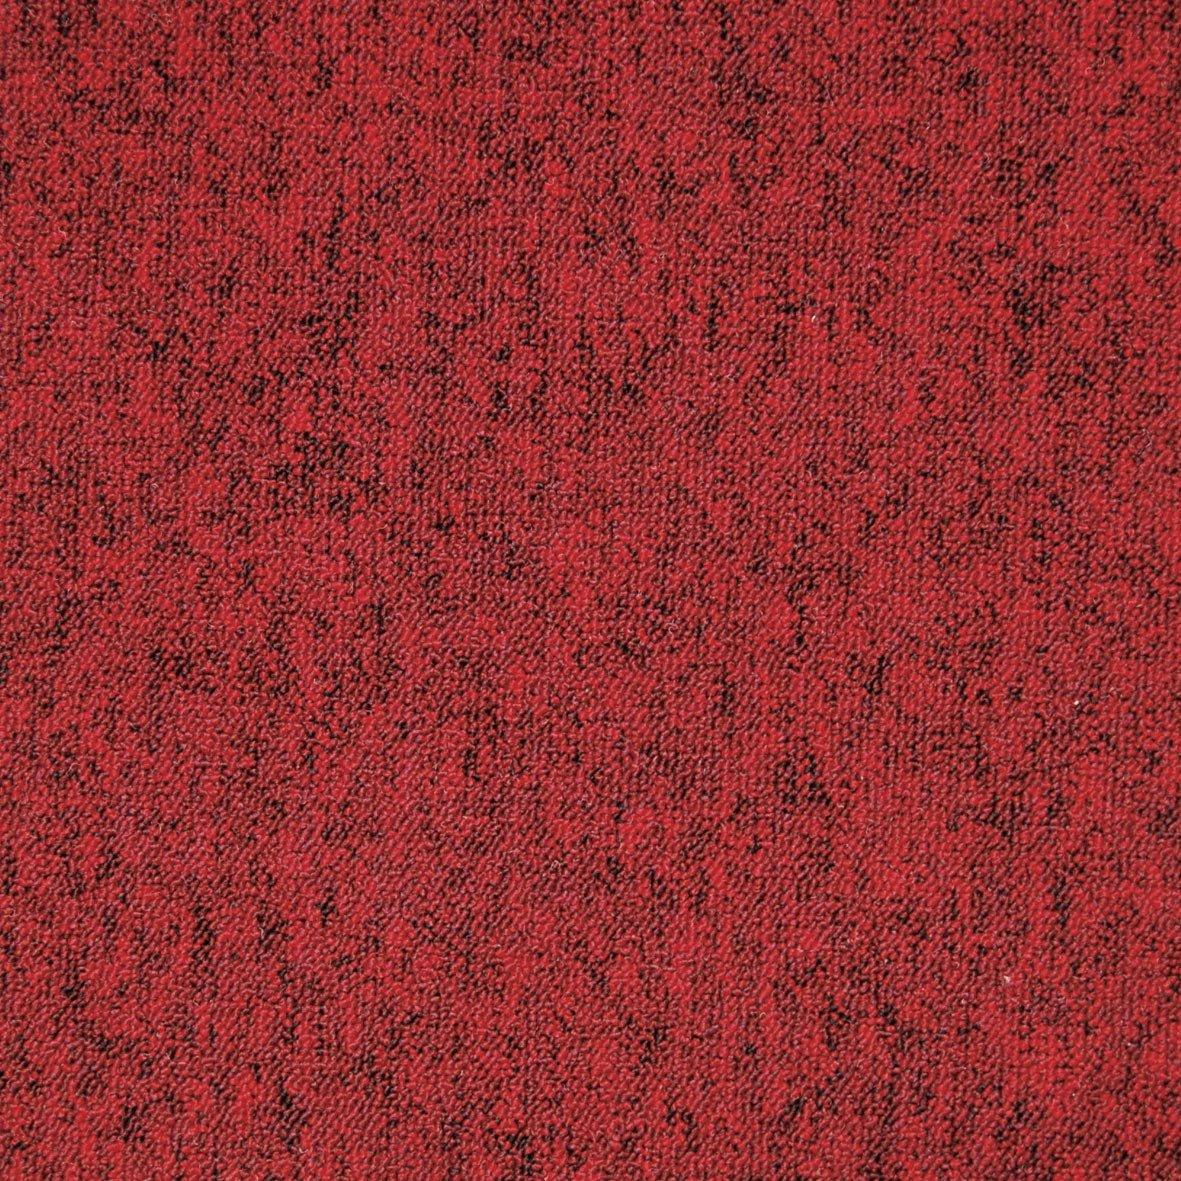 moquette rouge leroy merlin moquette velours london artens argent m leroy merlin with moquette. Black Bedroom Furniture Sets. Home Design Ideas